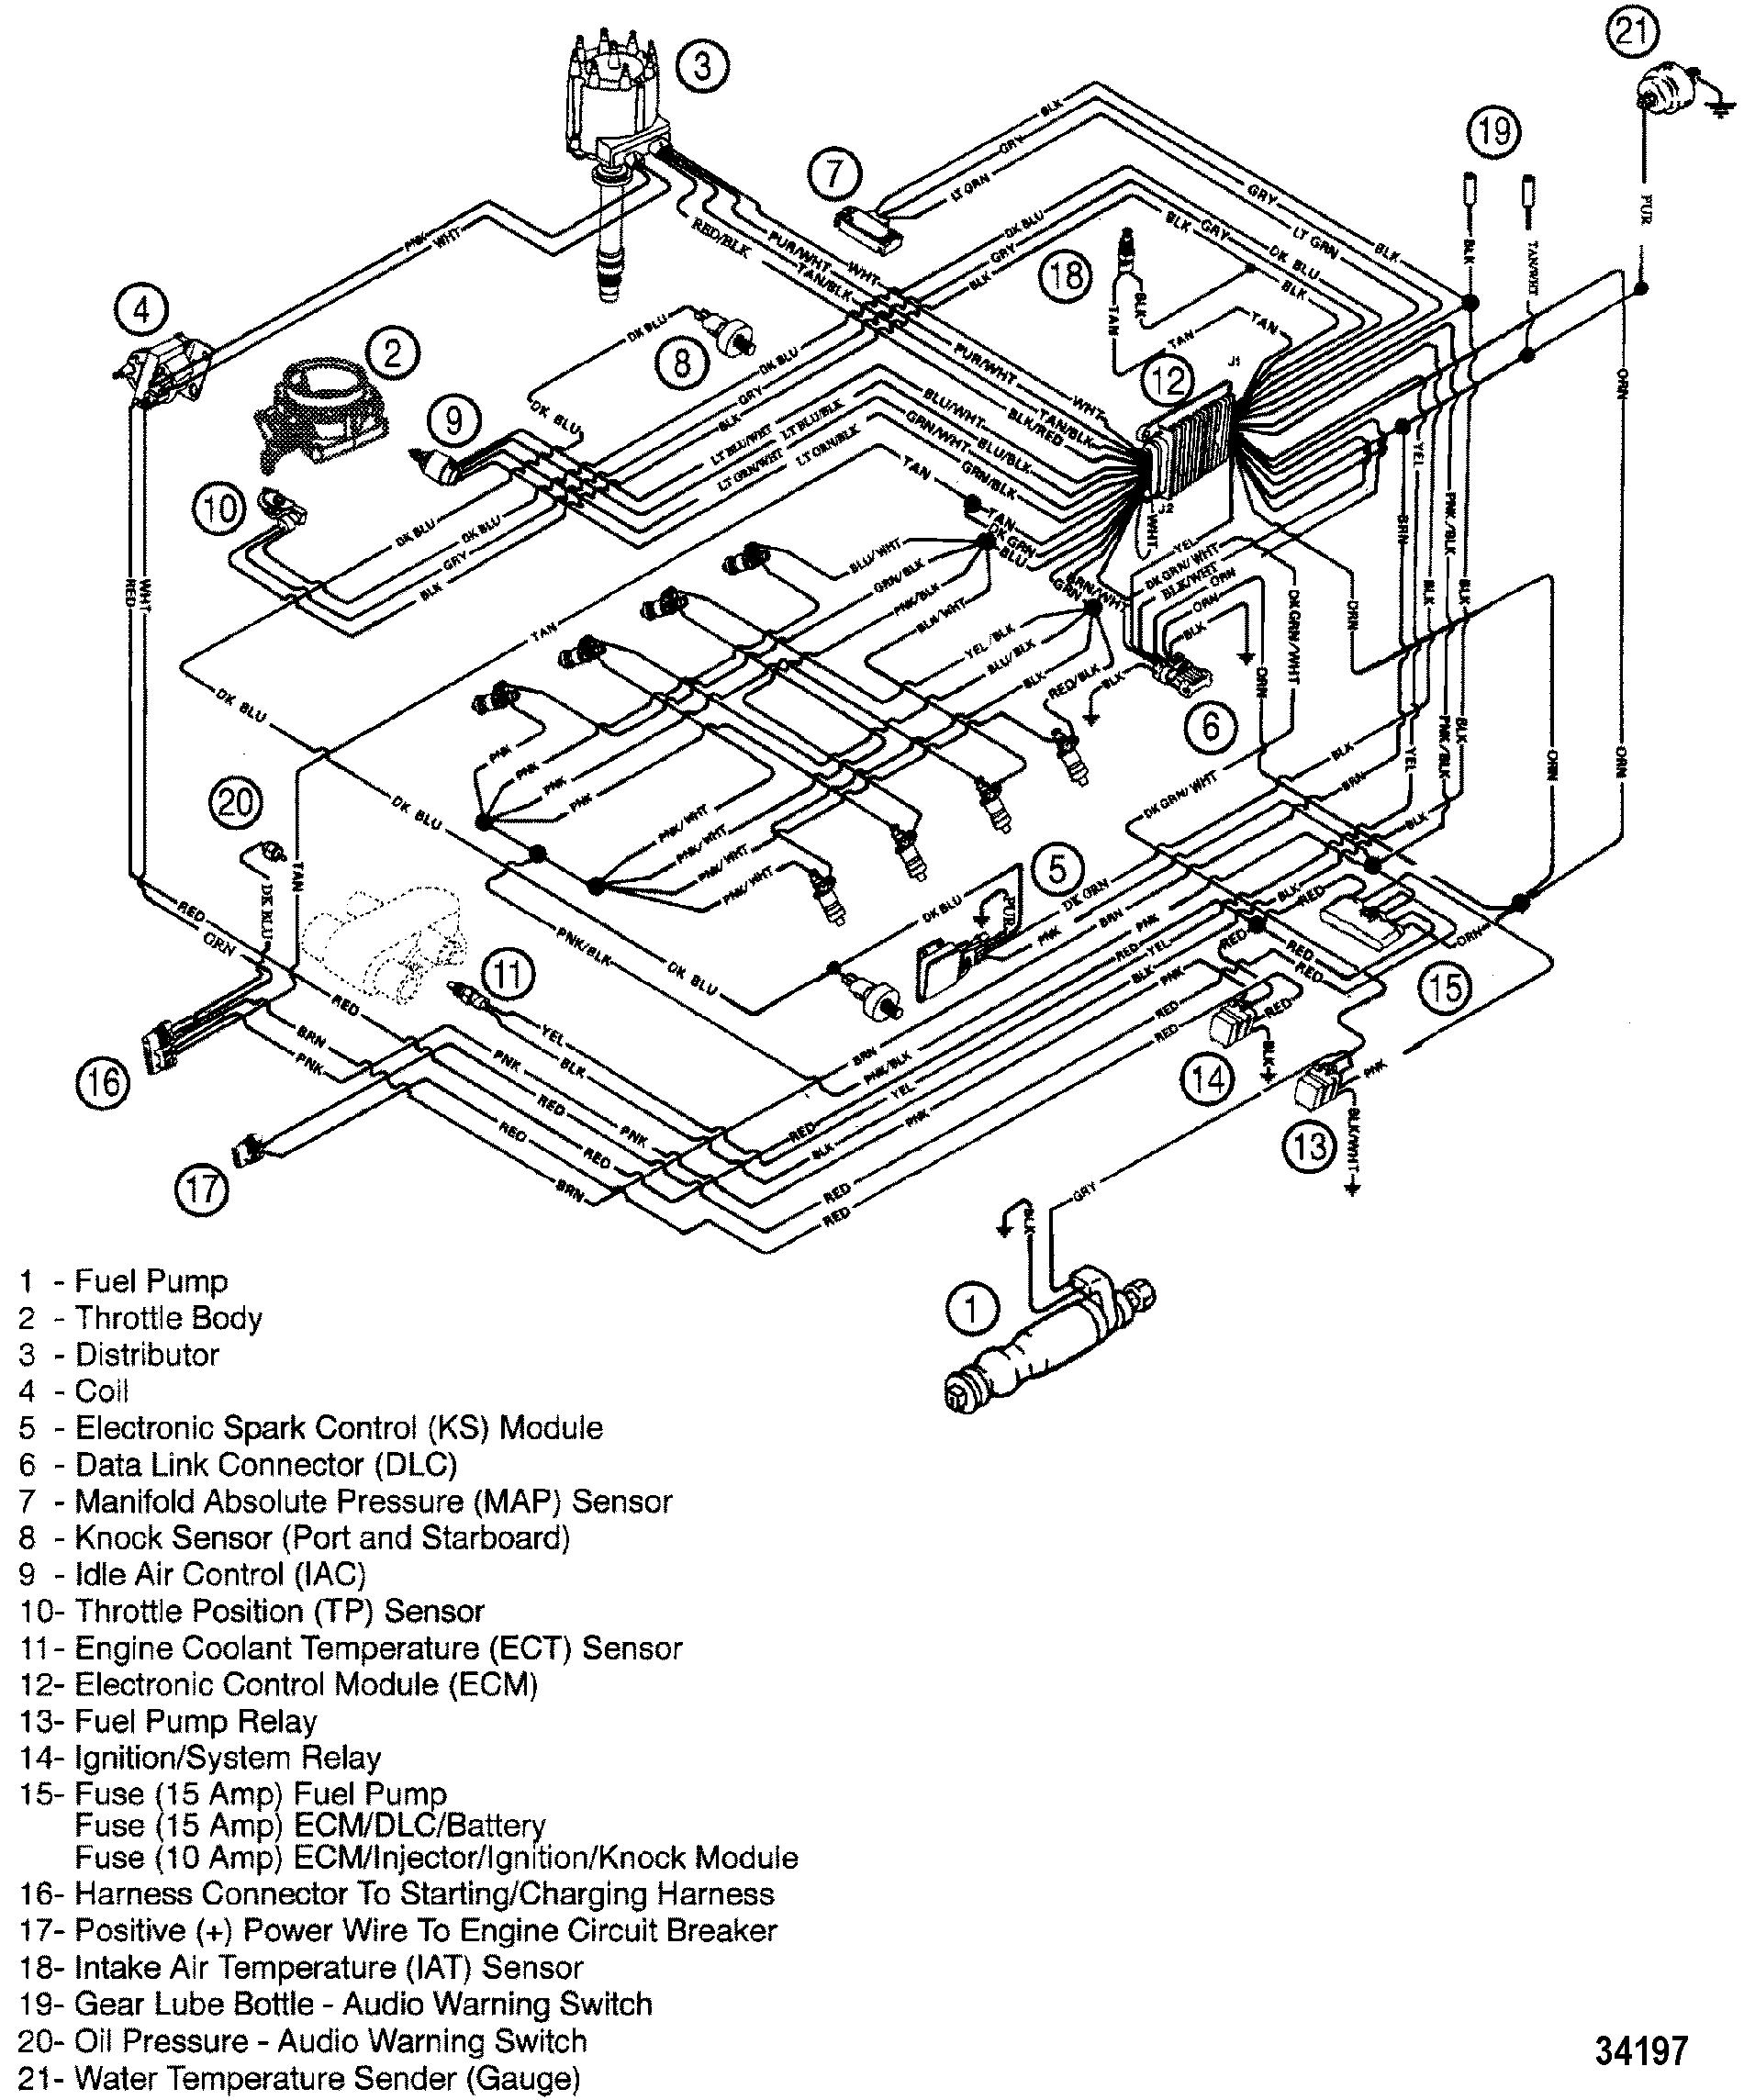 GG_8431] Mercruiser Engine Wiring Diagram On 3 7 Mercruiser Starter Wiring  Schematic WiringNerve Umng Umng Oupli Rect Sapebe Mohammedshrine Librar Wiring 101